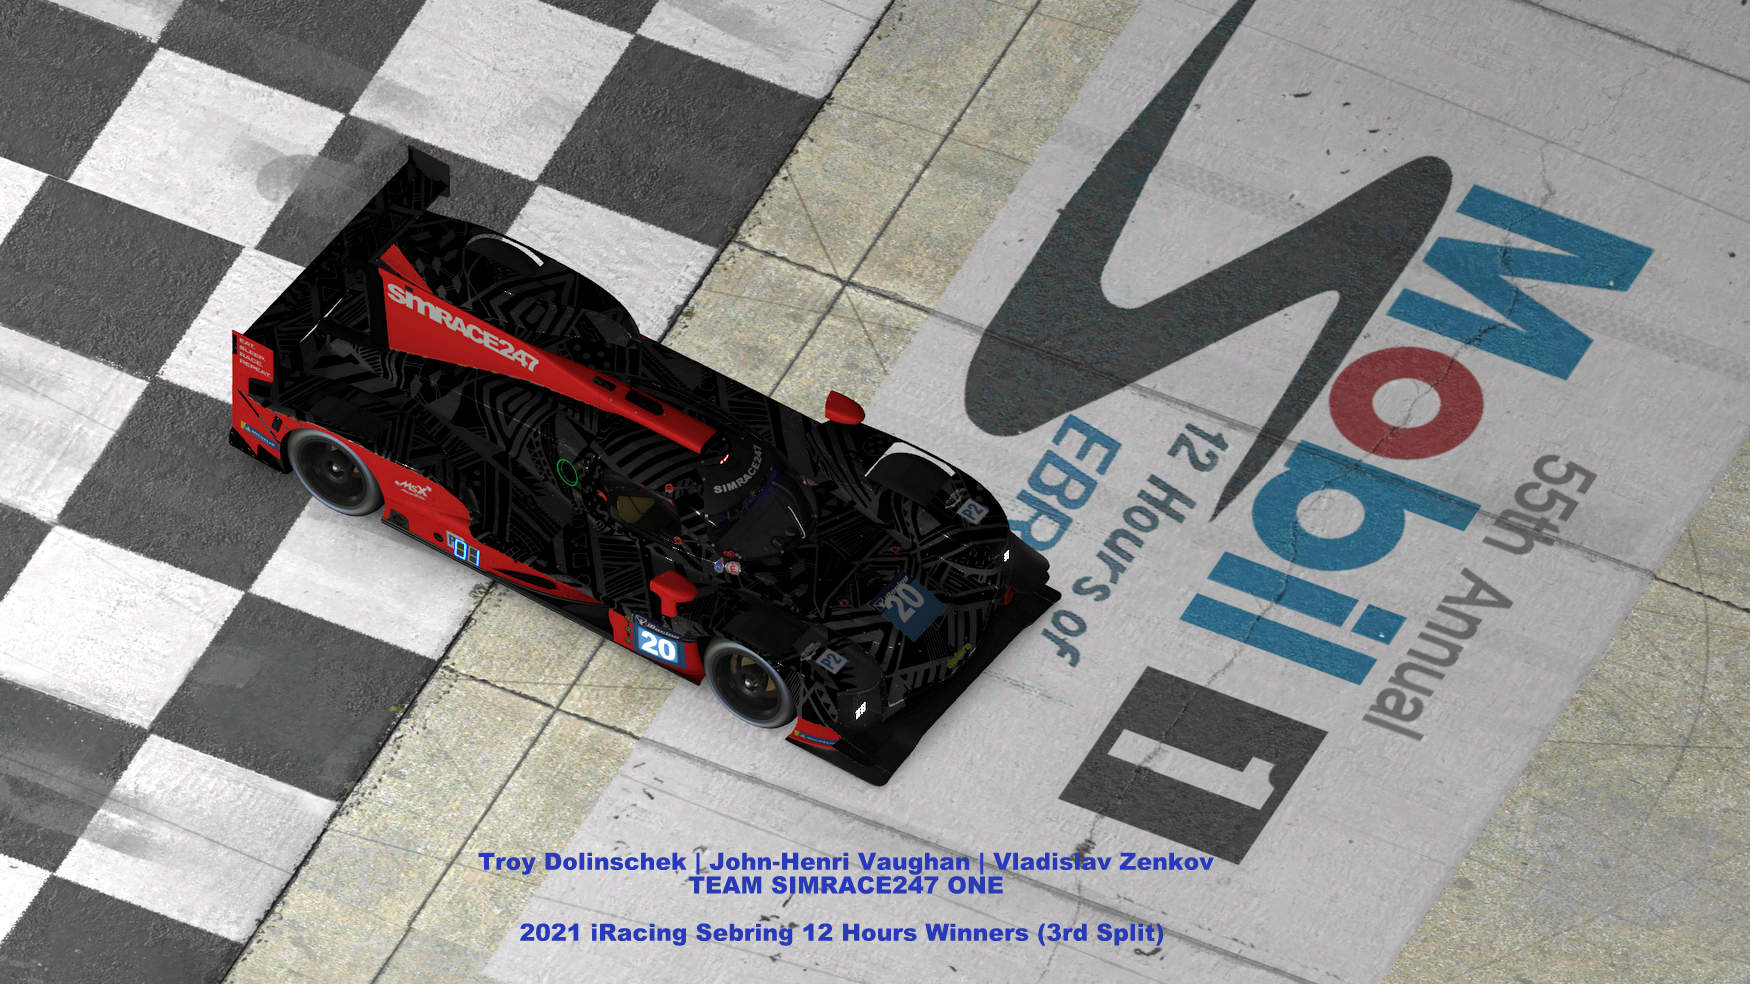 iRacing Sebring 12H: Team SIMRACE247 win third split